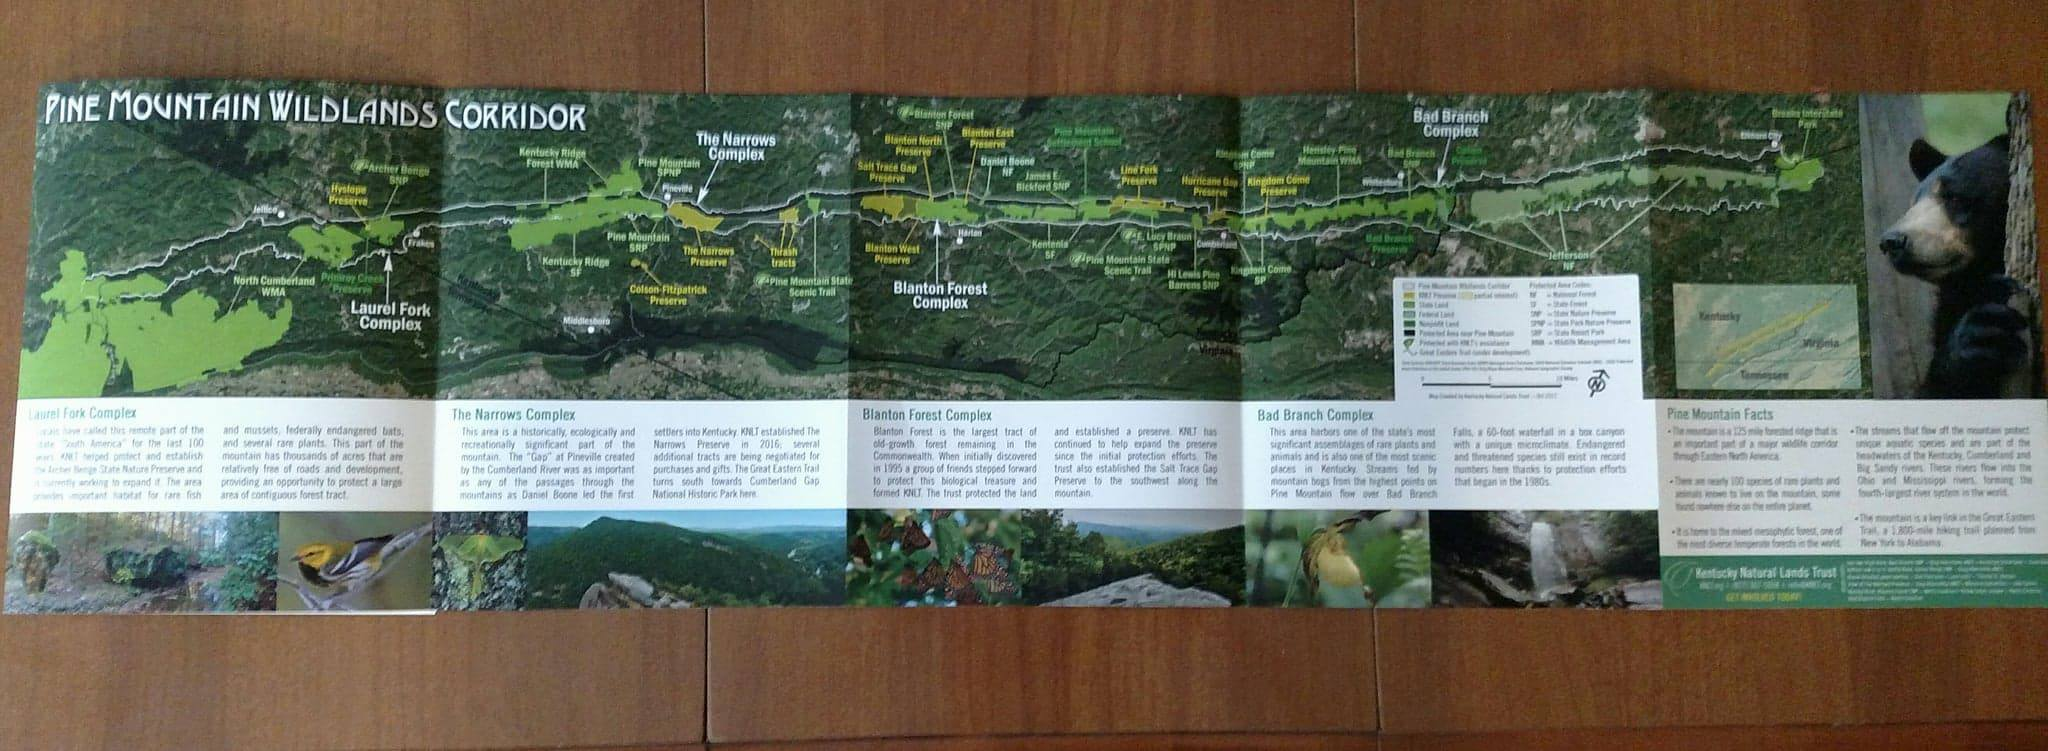 Pine Mountain Woodlands Corridor